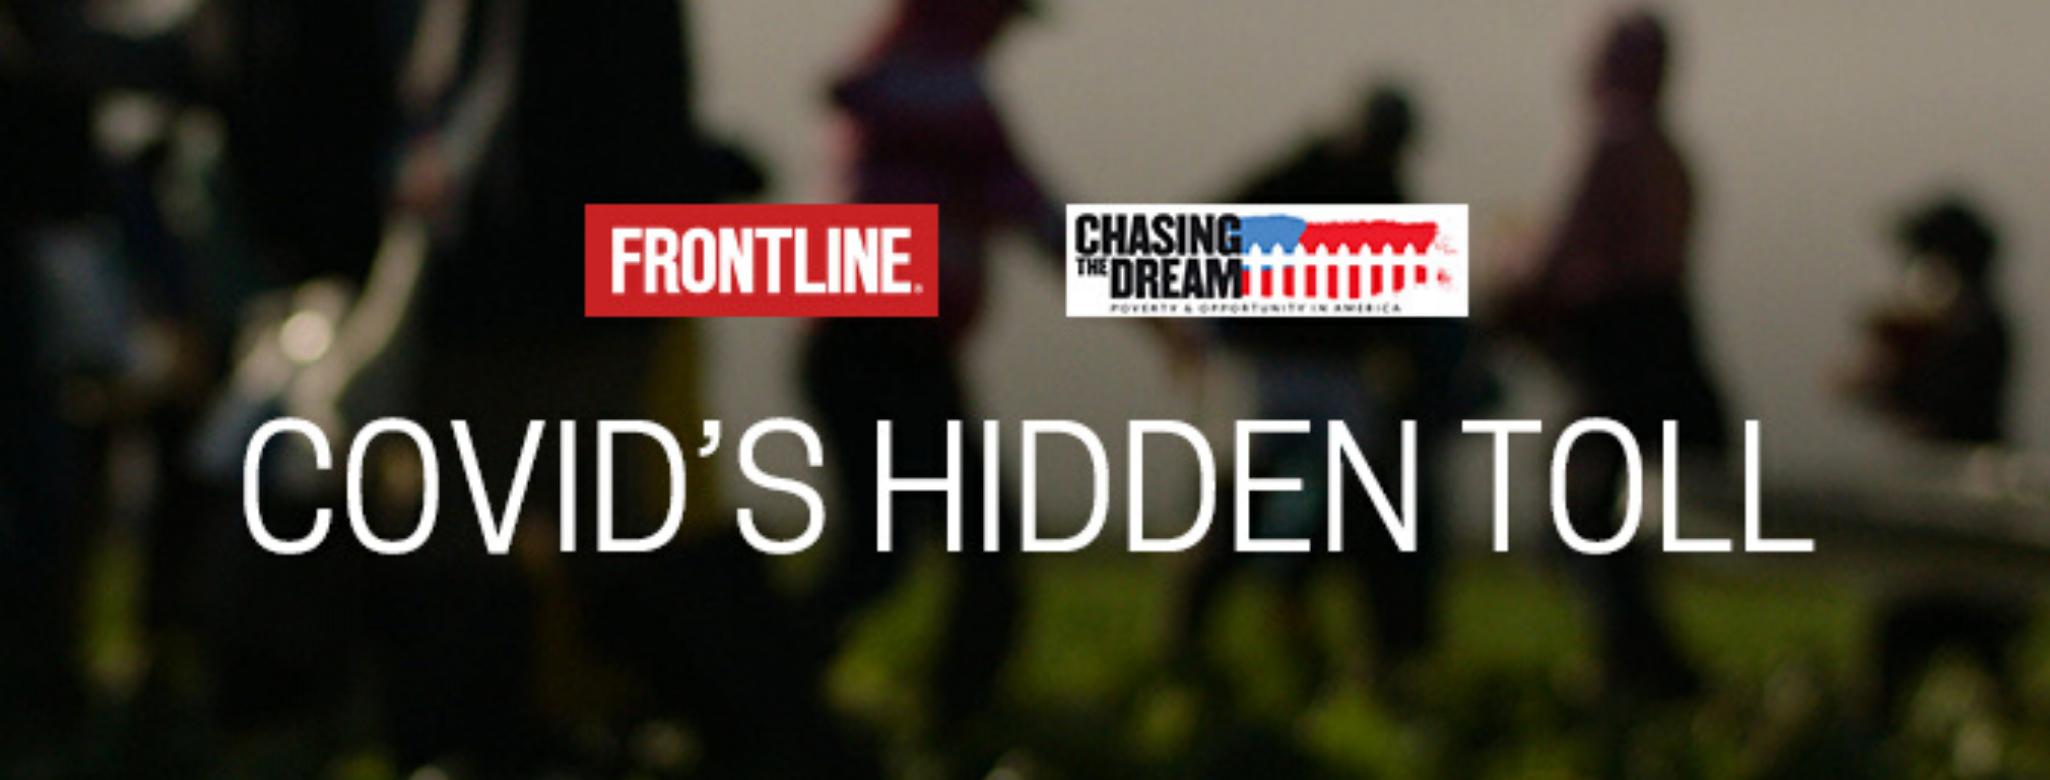 COVID's Hidden Toll | A FRONTLINE Film